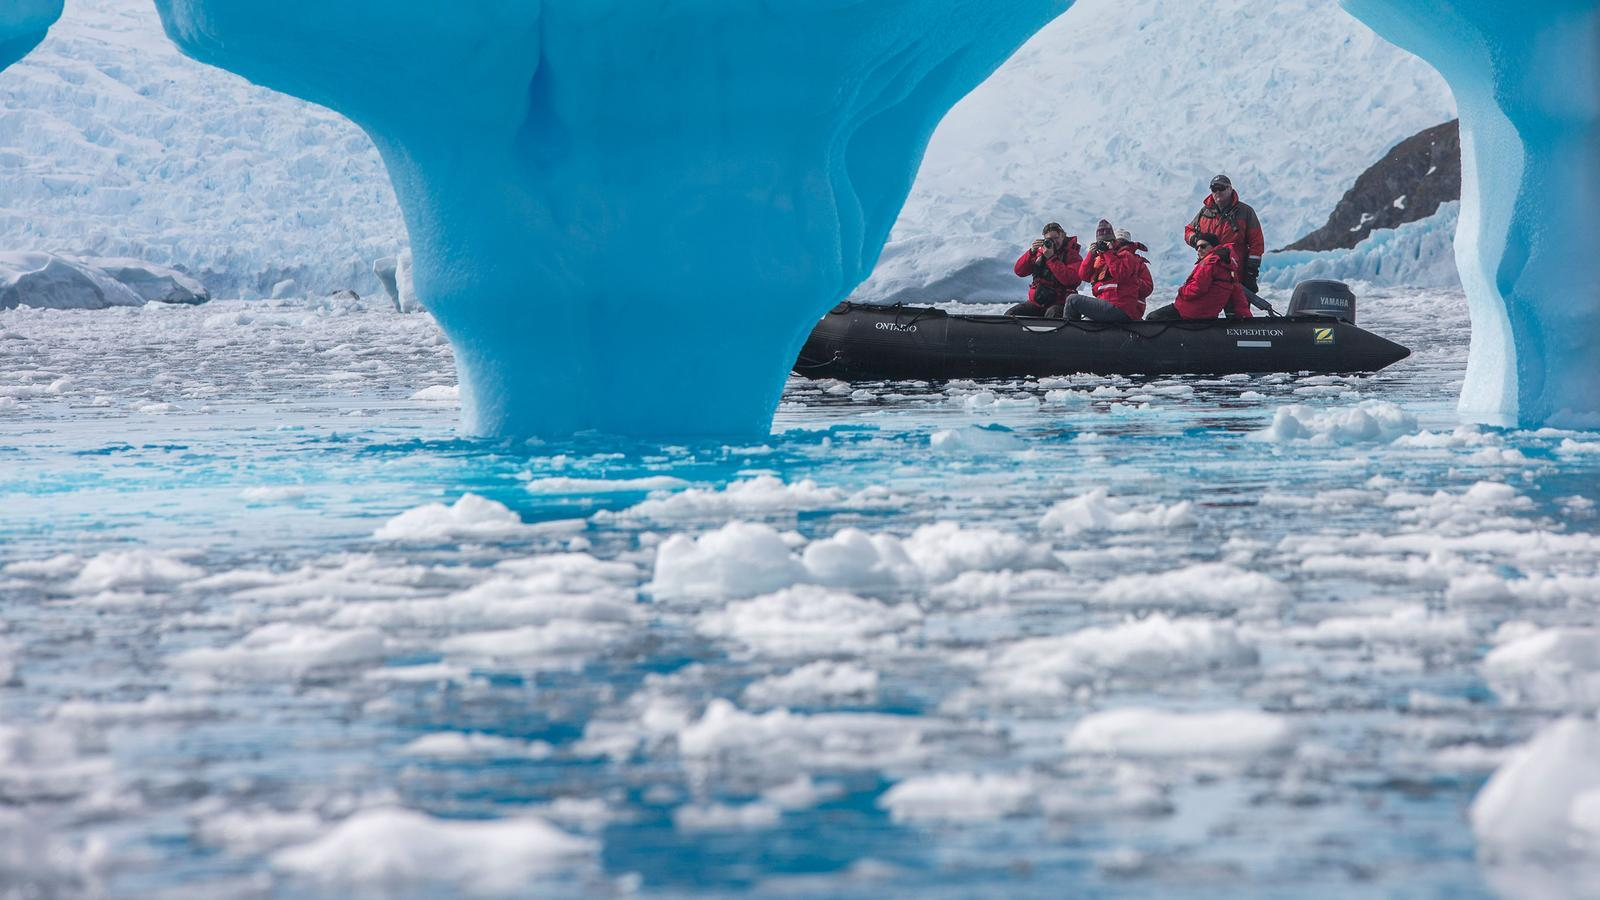 One World Trips - Spirit of Shackleton